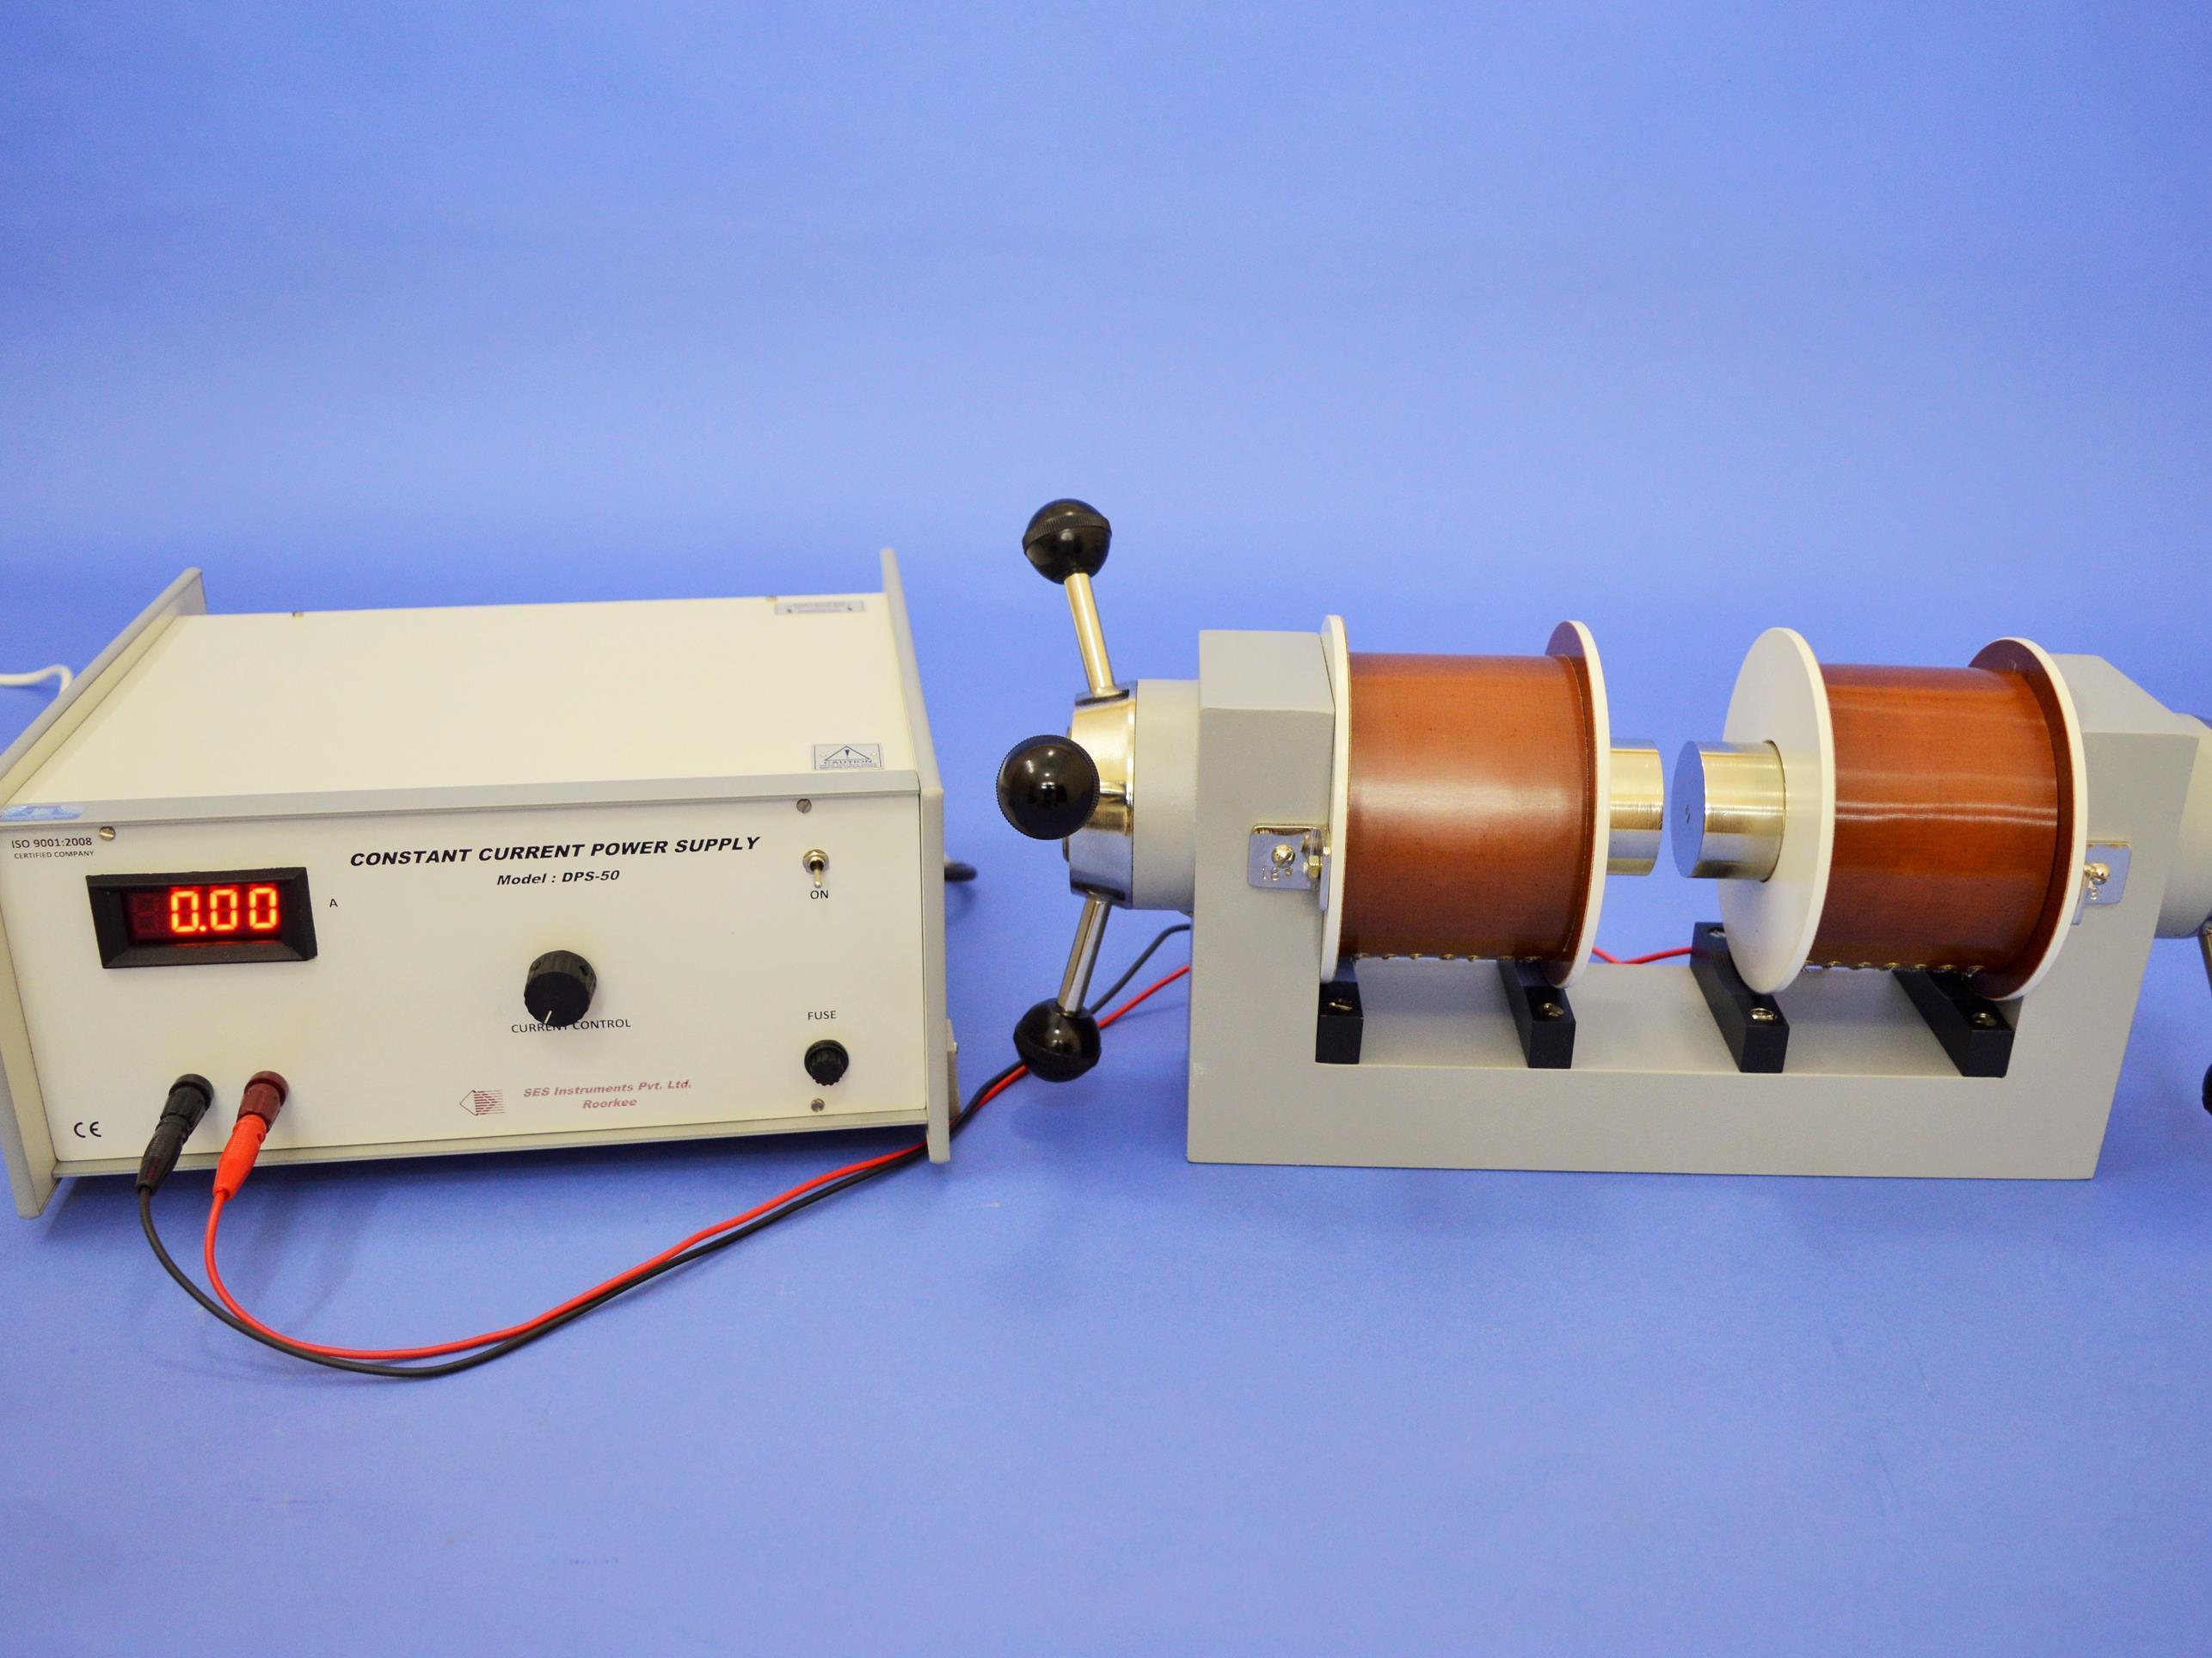 Electromagnet & Power Supply, EMU-50 & DPS-50